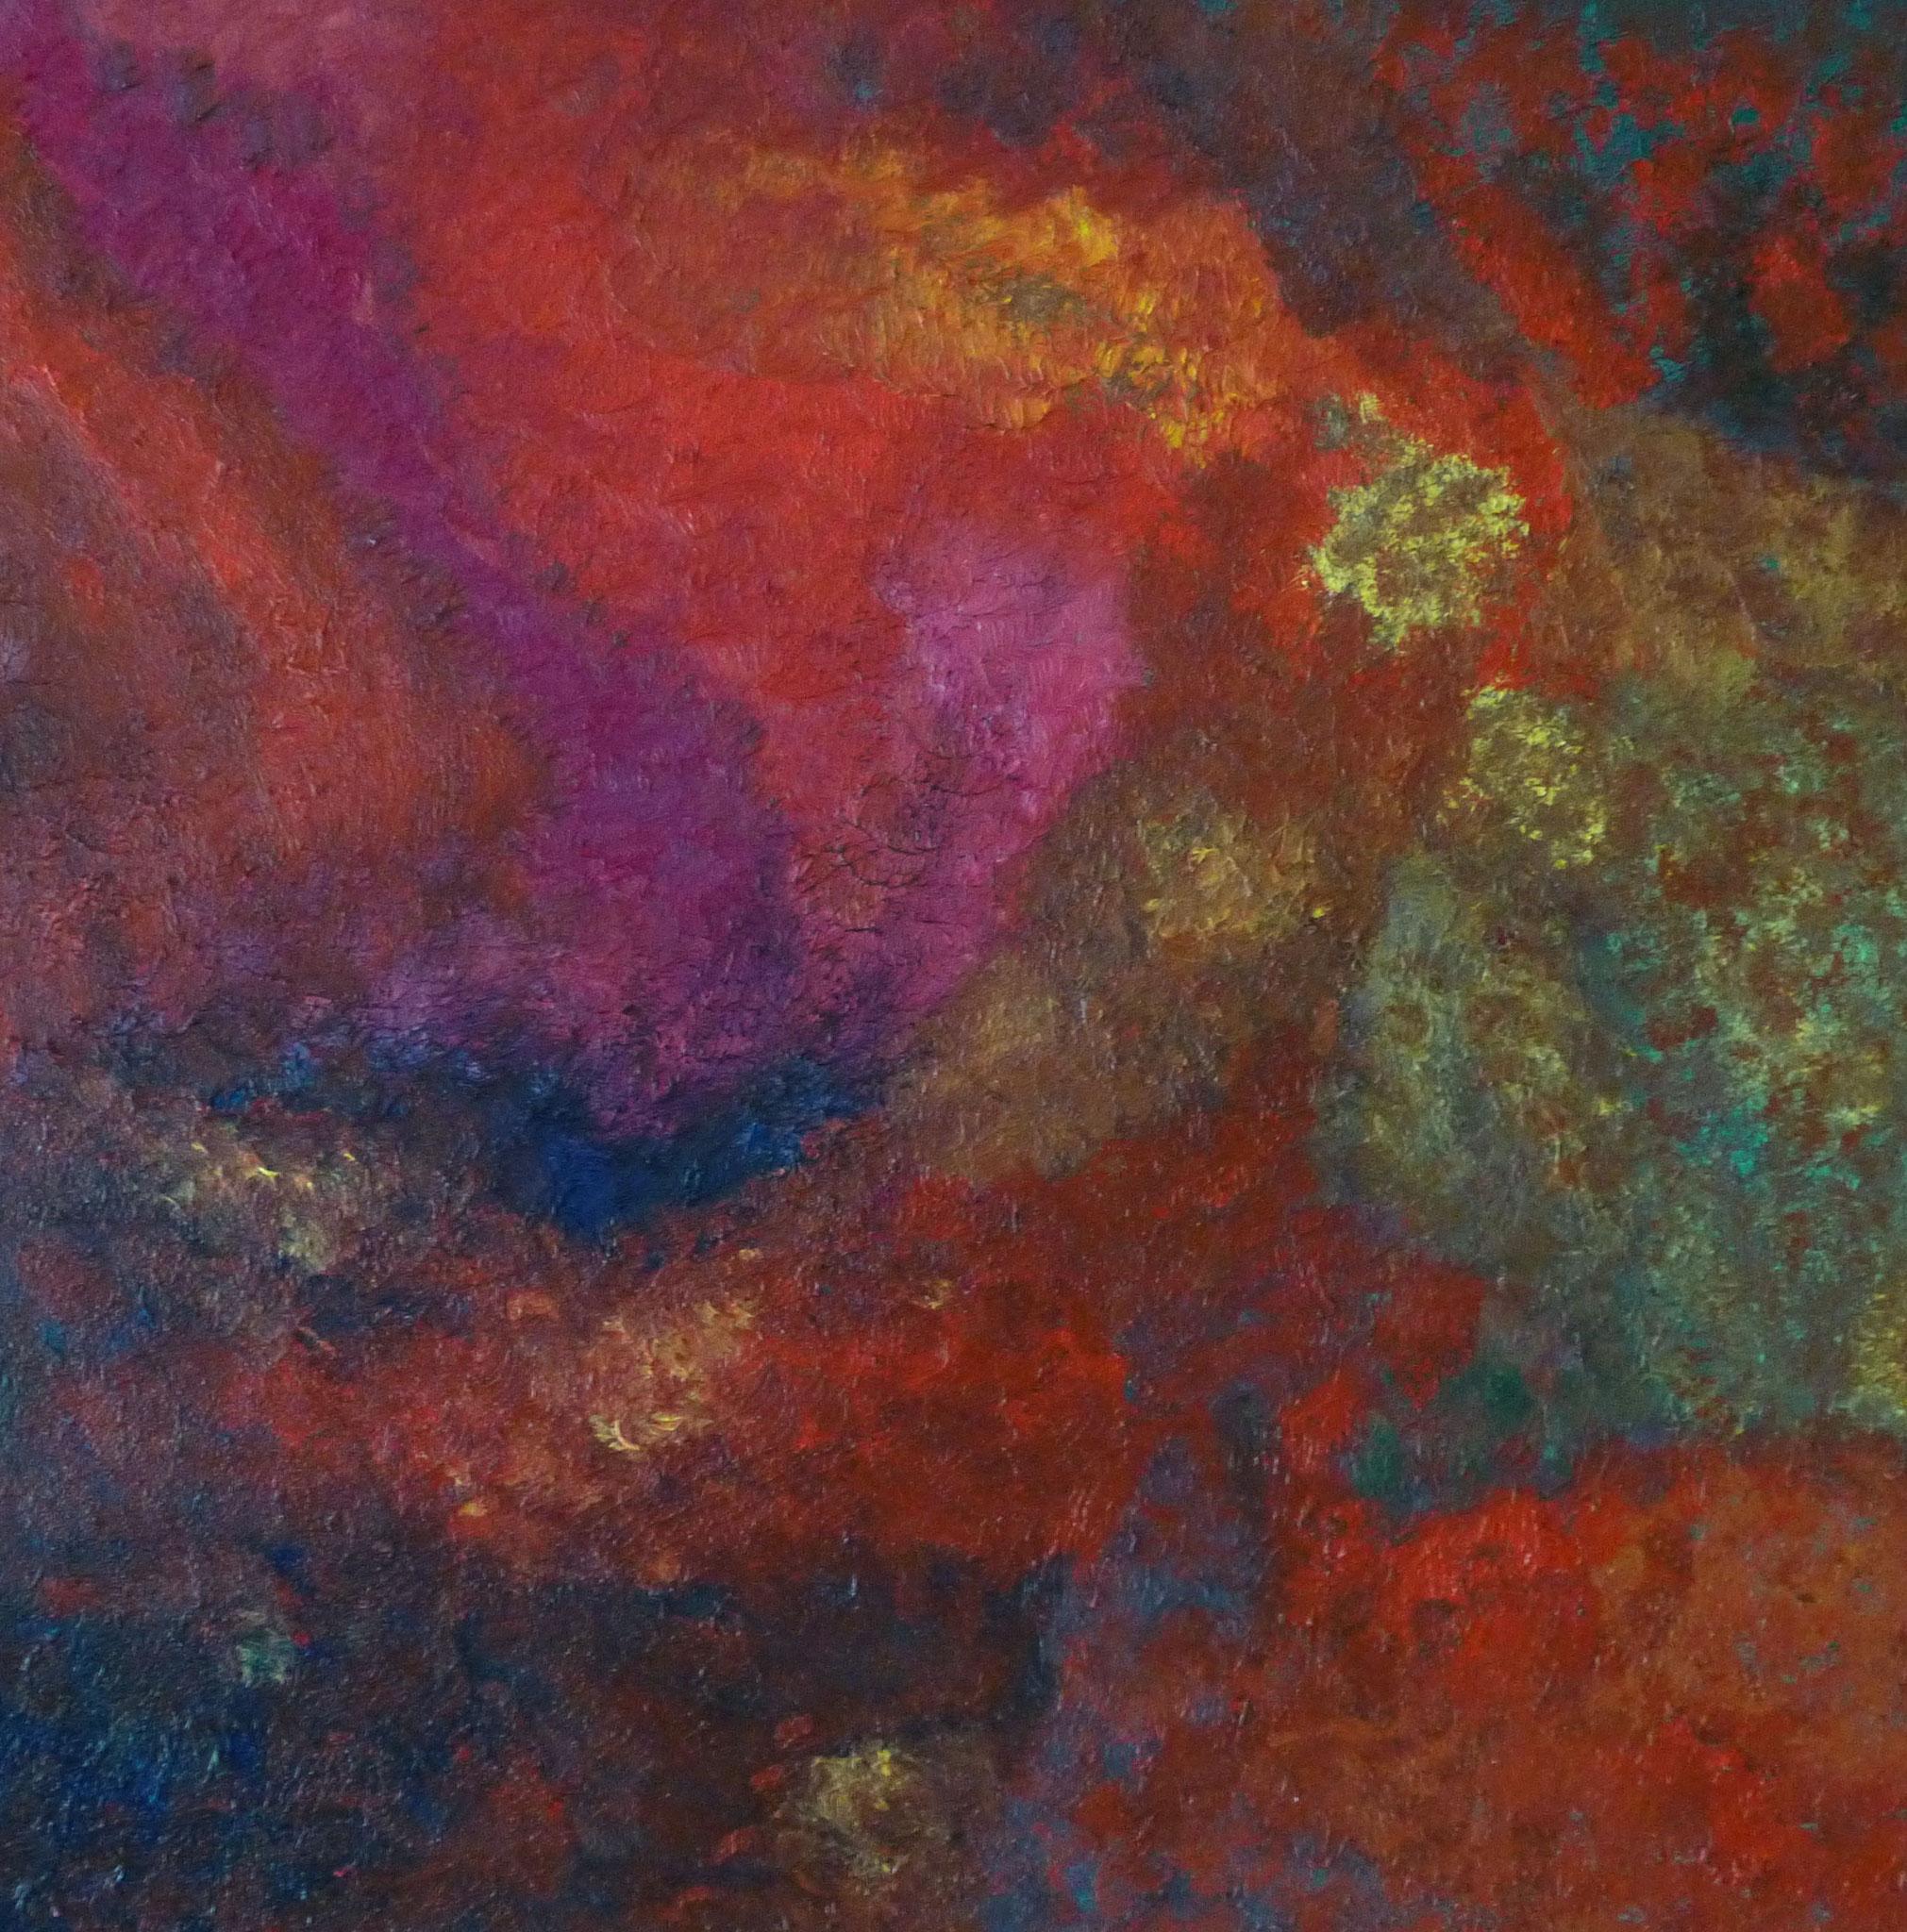 Farbenspiele-1     50 cm x 50 cm